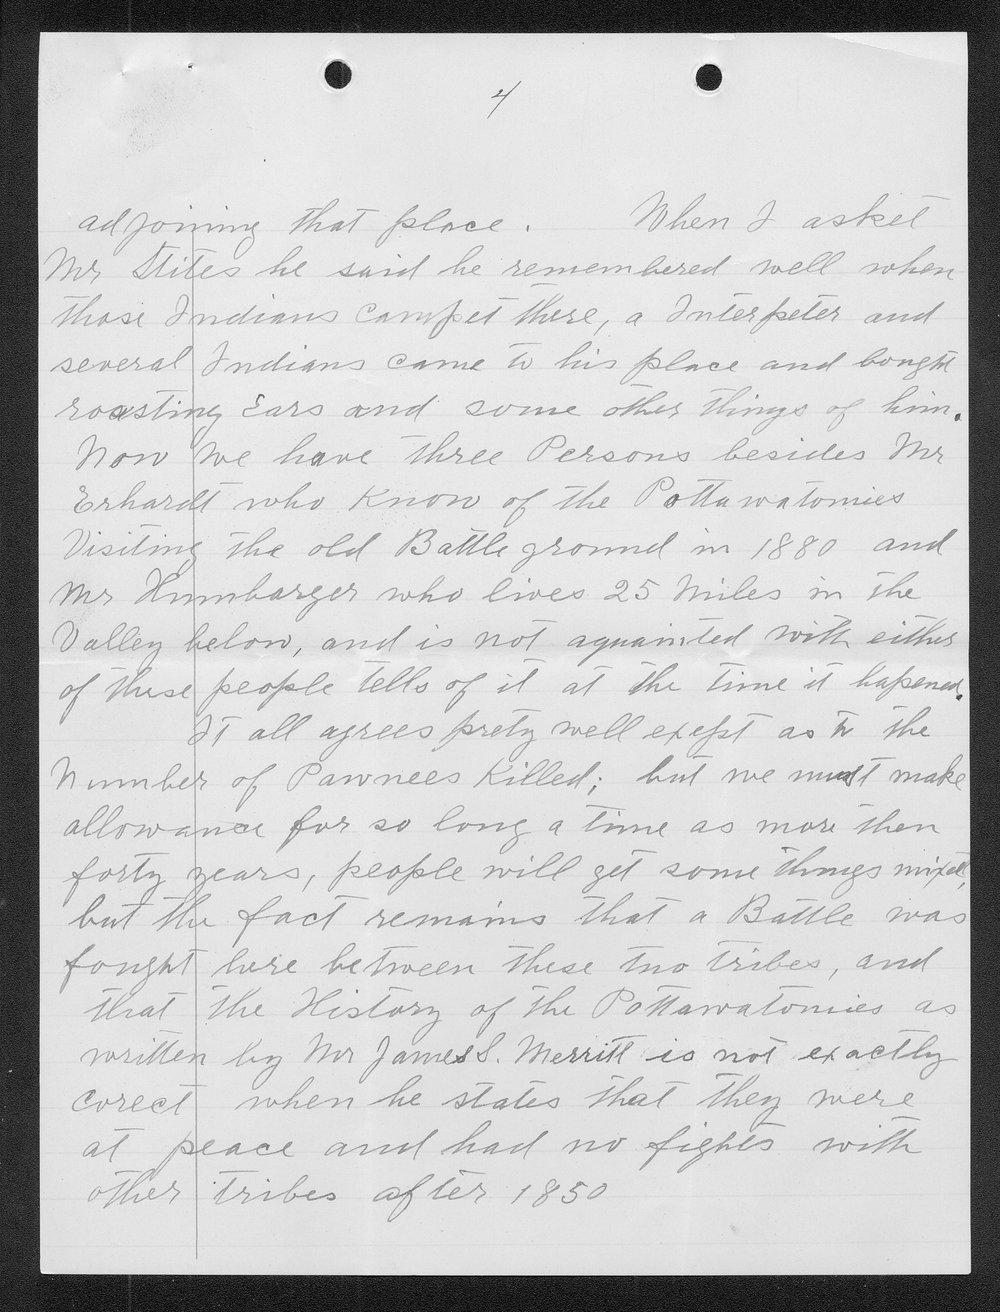 Adolph Roenigk and George W. Martin correspondence - 11